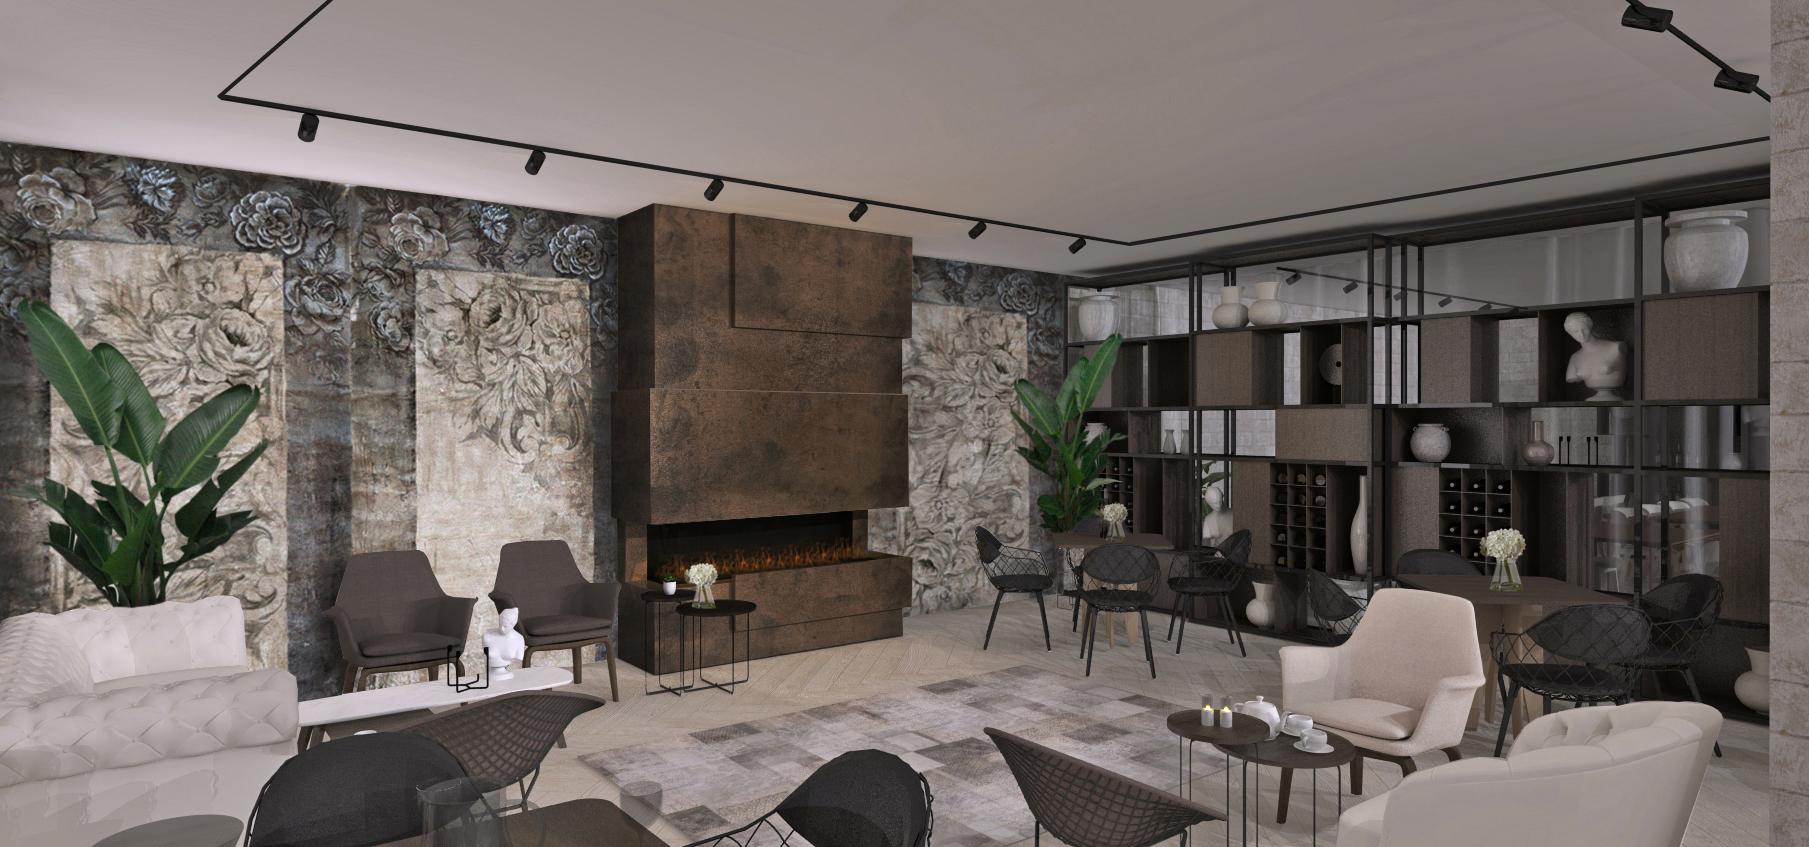 Probus lounge 2 c2